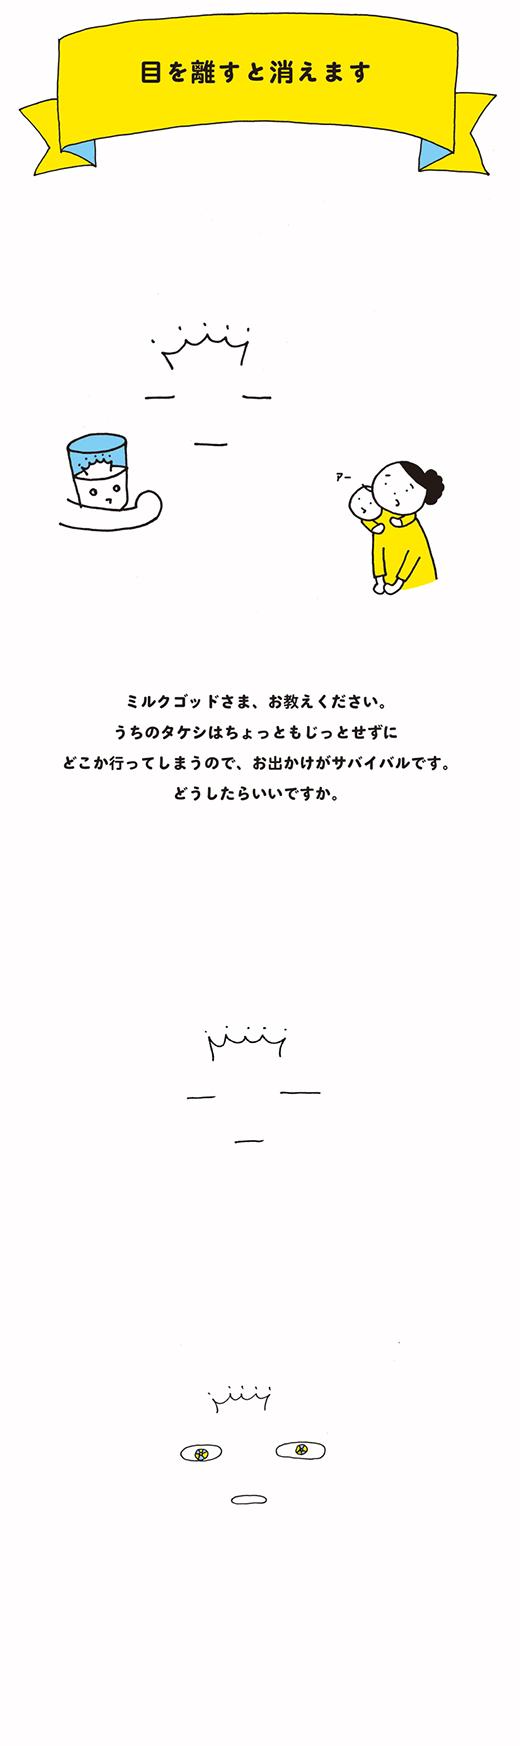 milGOD_1009_01